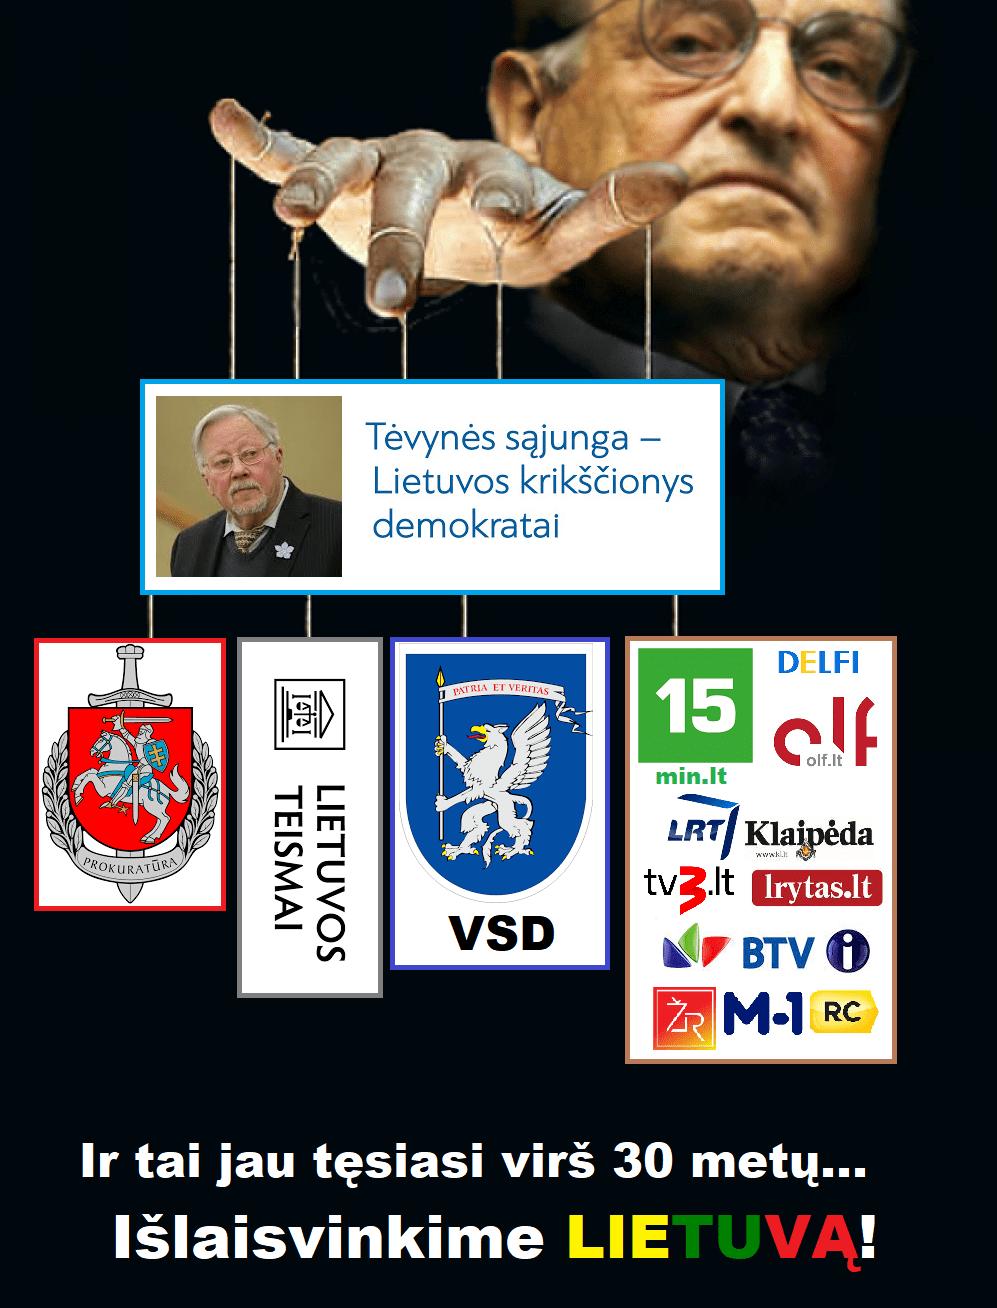 Sorošo valdymo sistema Sorošas Lietuvoje Landsbergis Sorošo